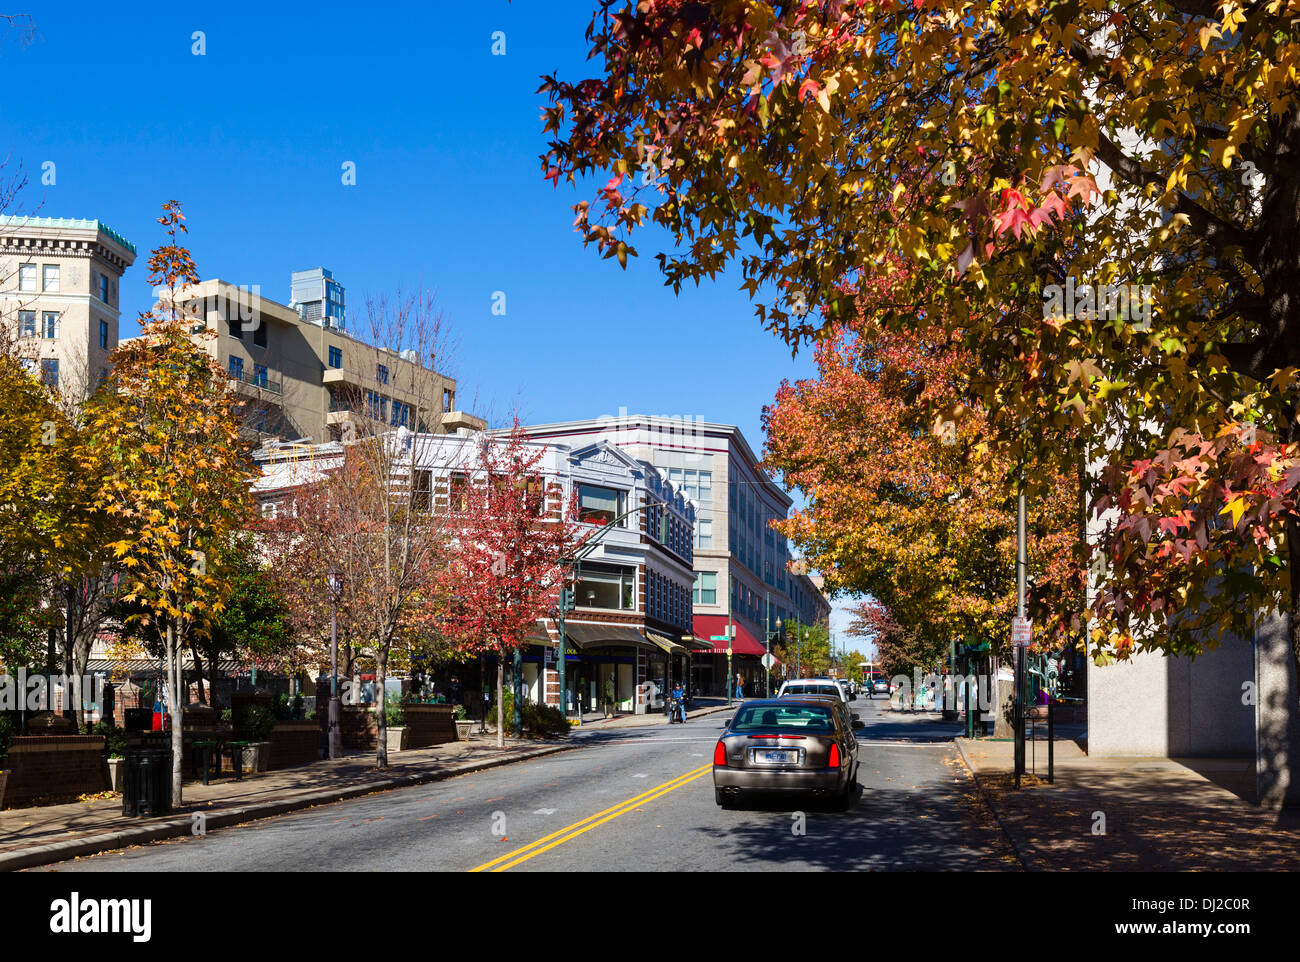 Haywood Street in downtown Asheville, North Carolina, USA - Stock Image